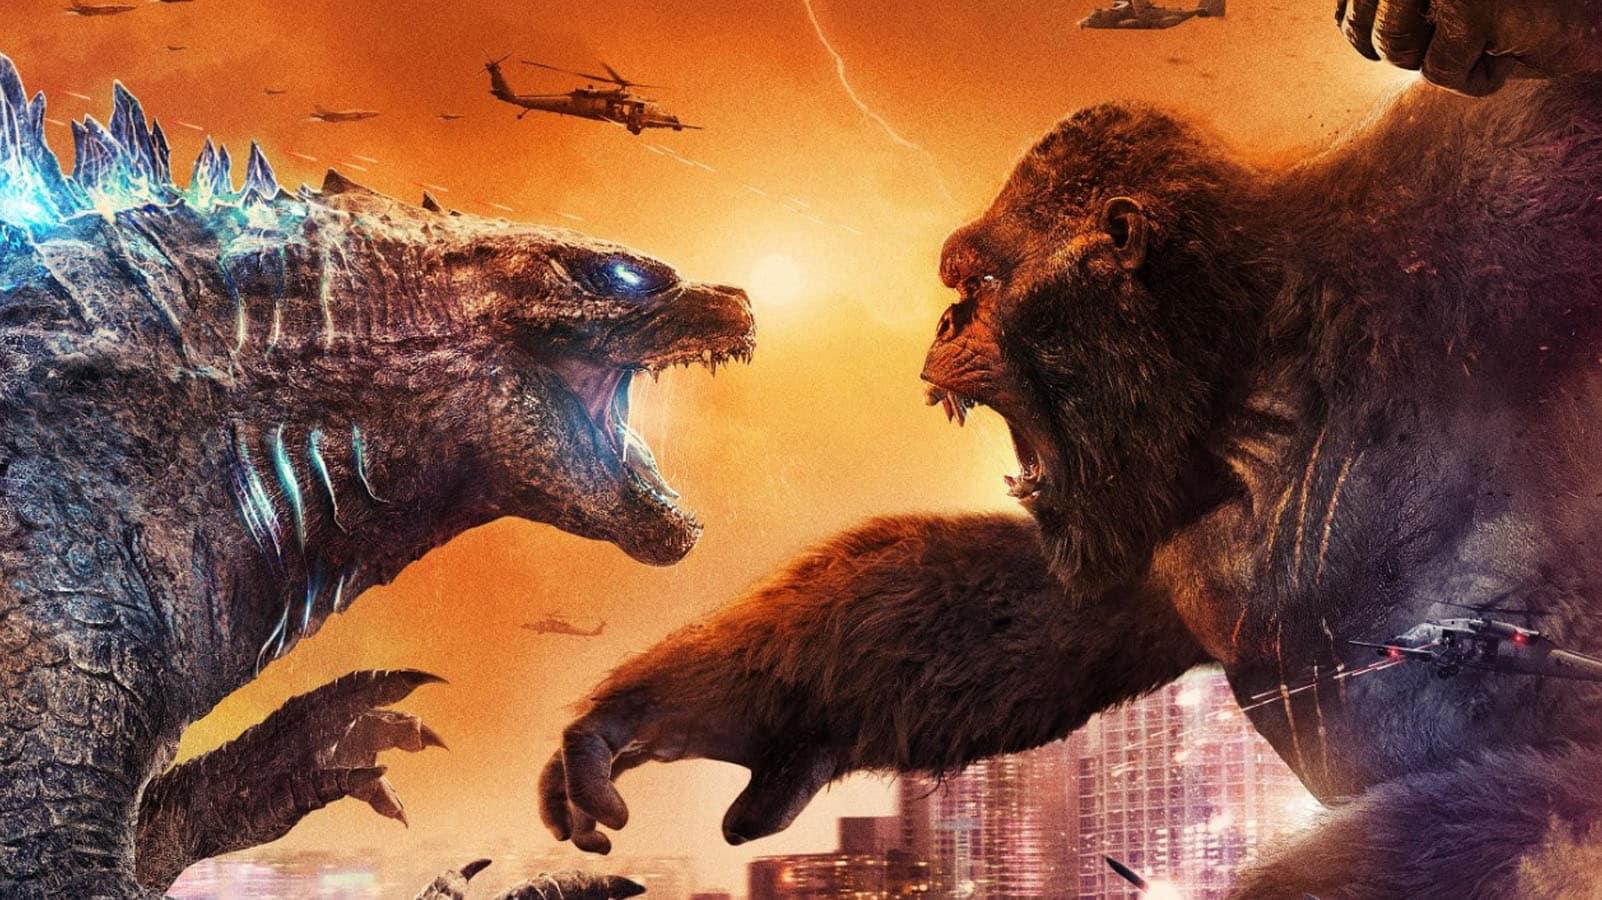 Godzilla vs. Kong: Tudo sobre o filme dos titãs do Monsterverse